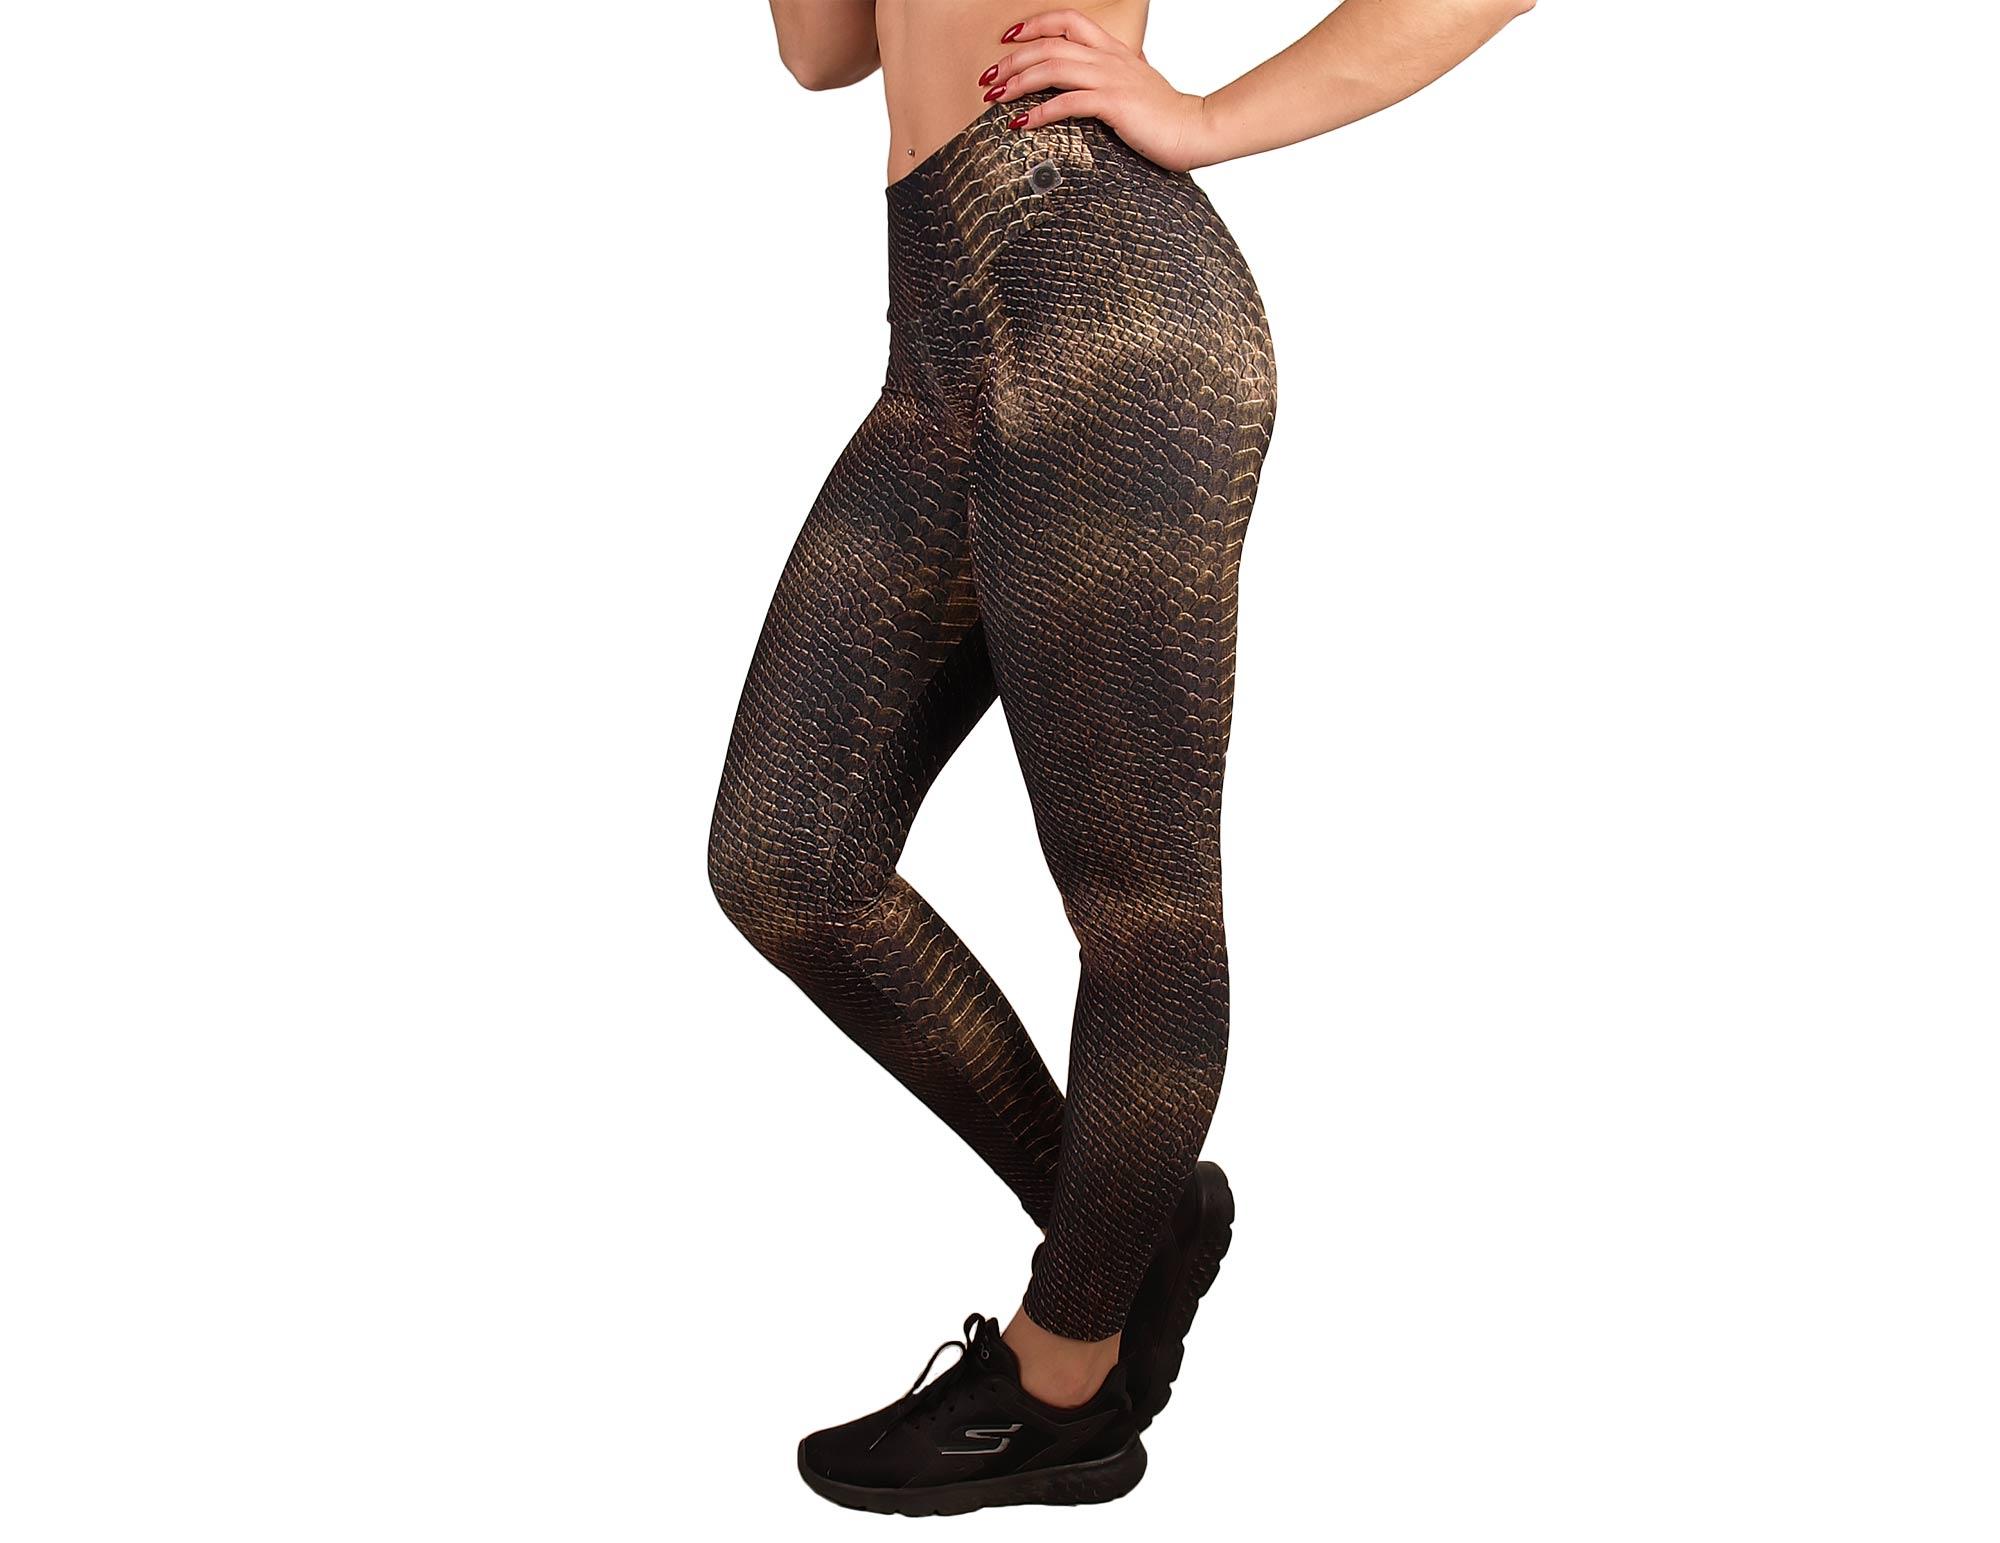 Legging sport mujer cintura alta animal estampado